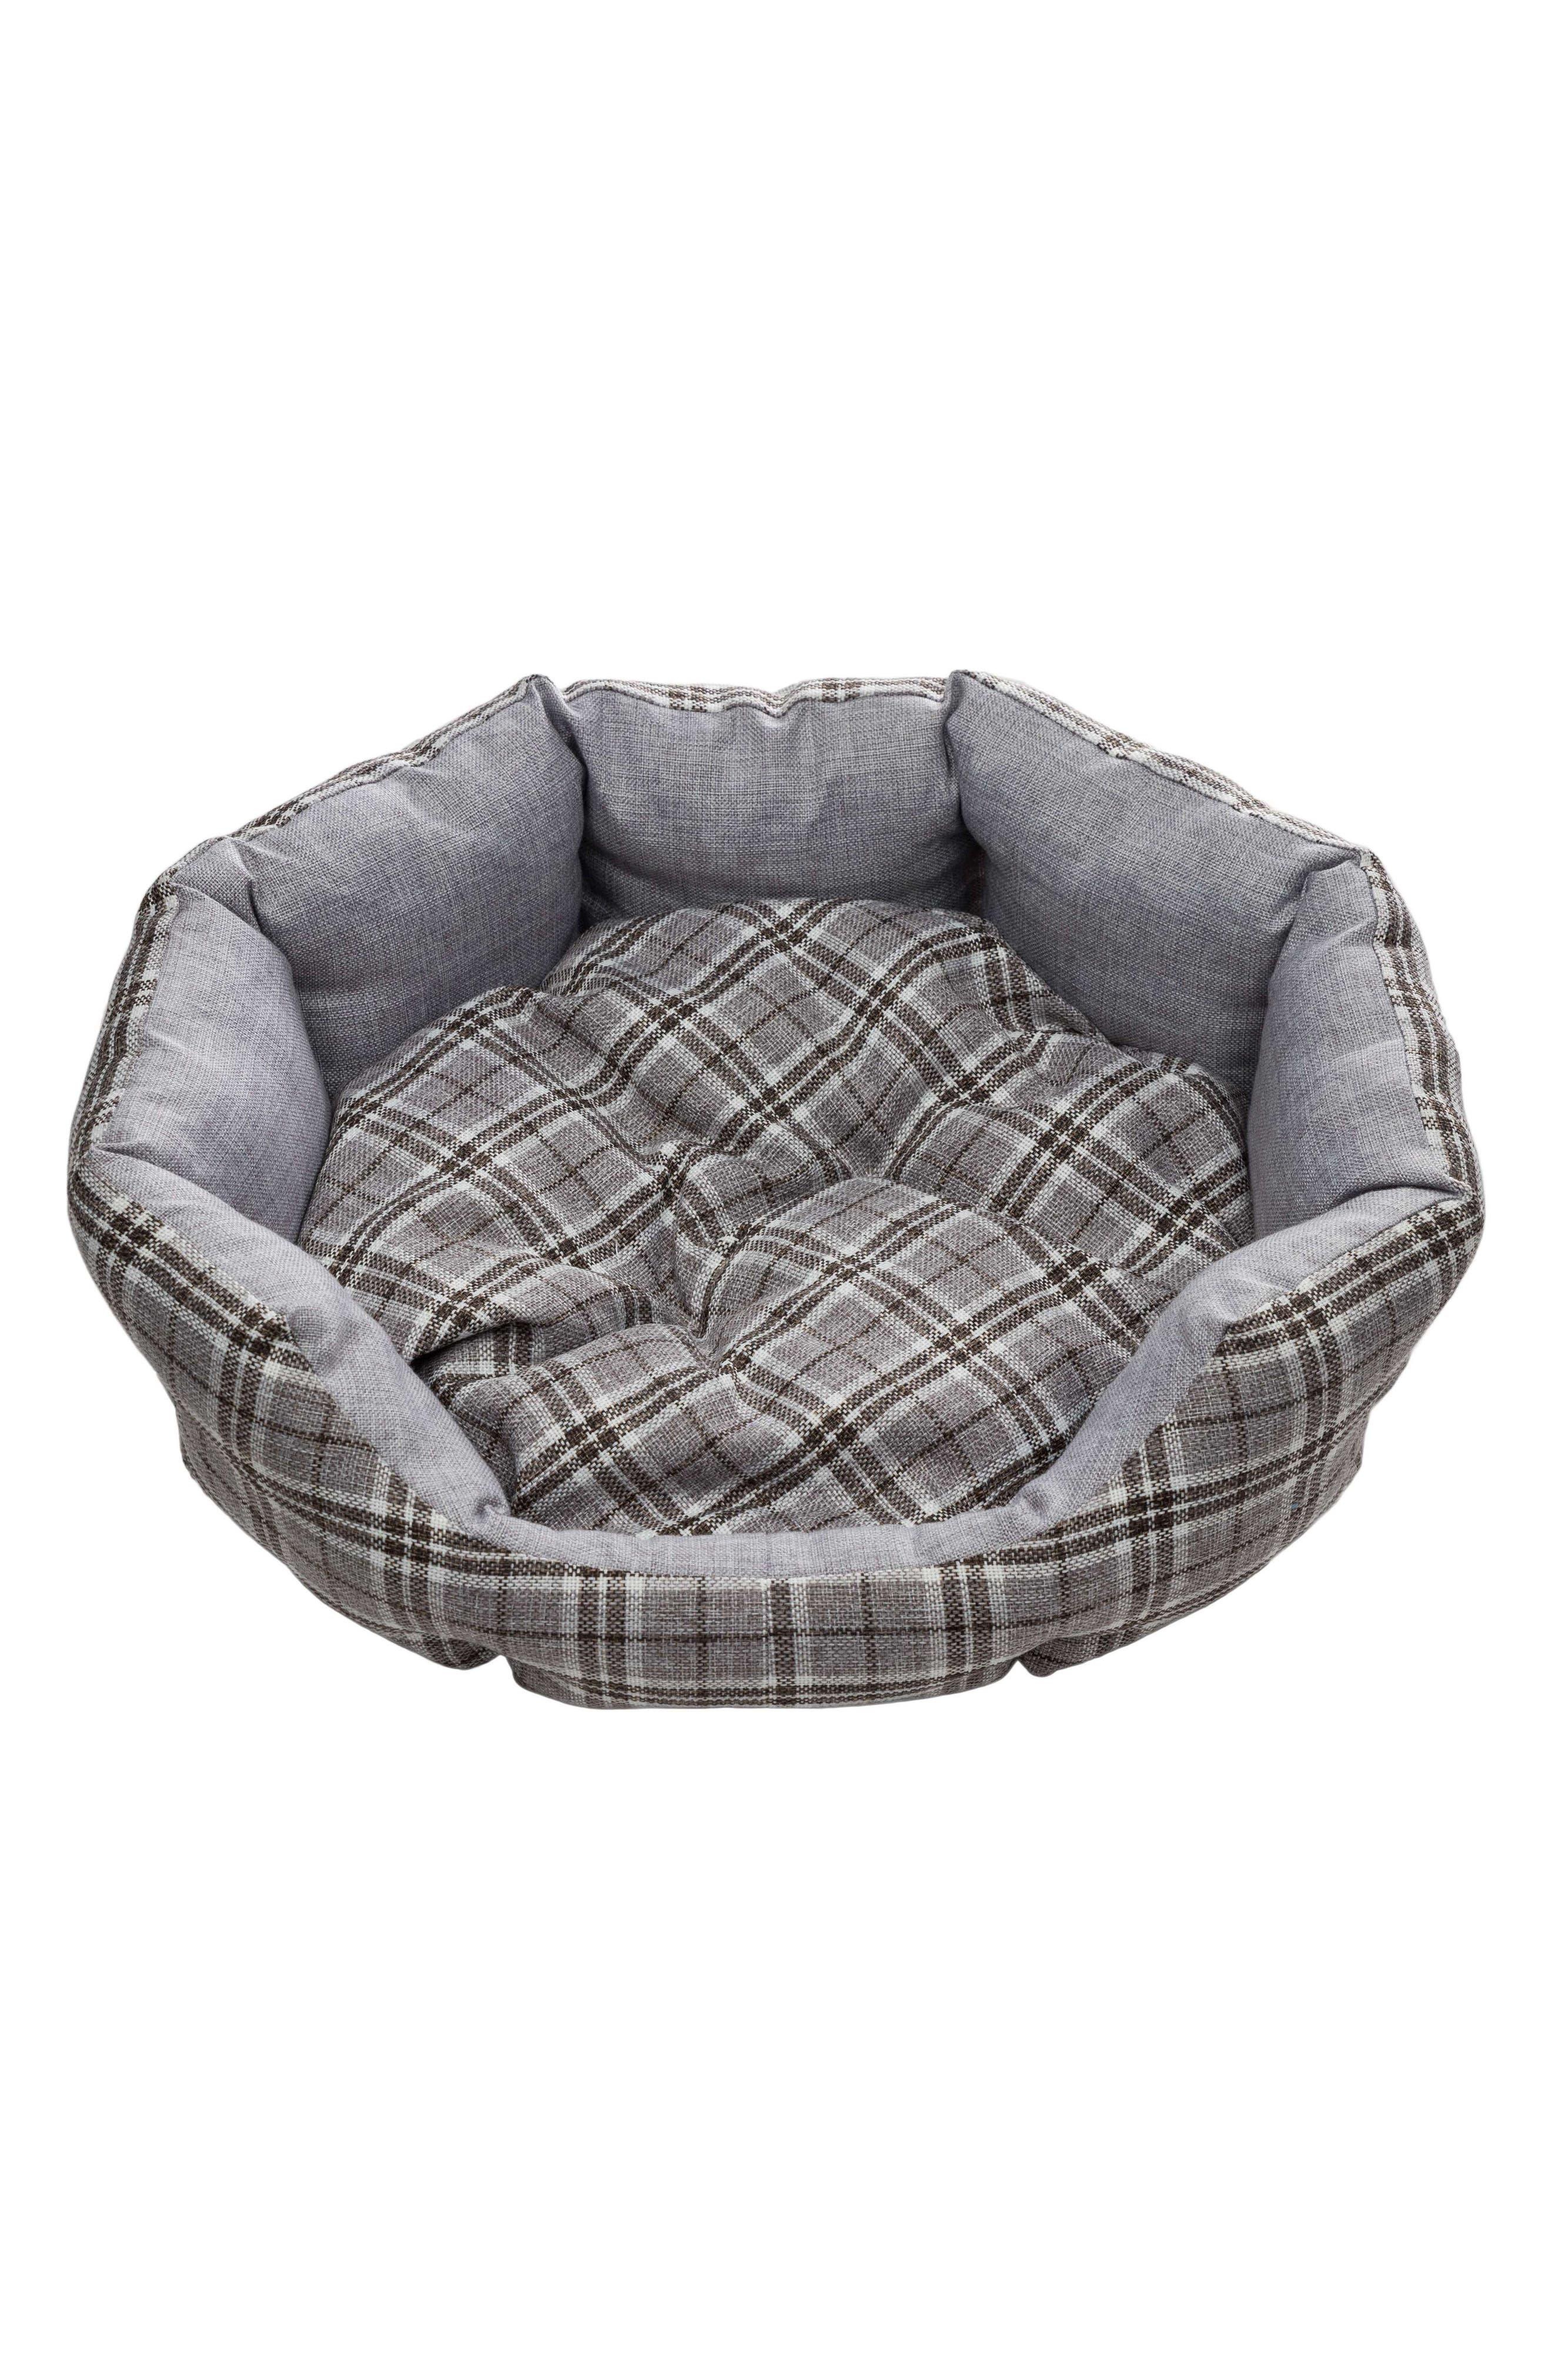 Harlee Round Pet Bed,                         Main,                         color, Grey